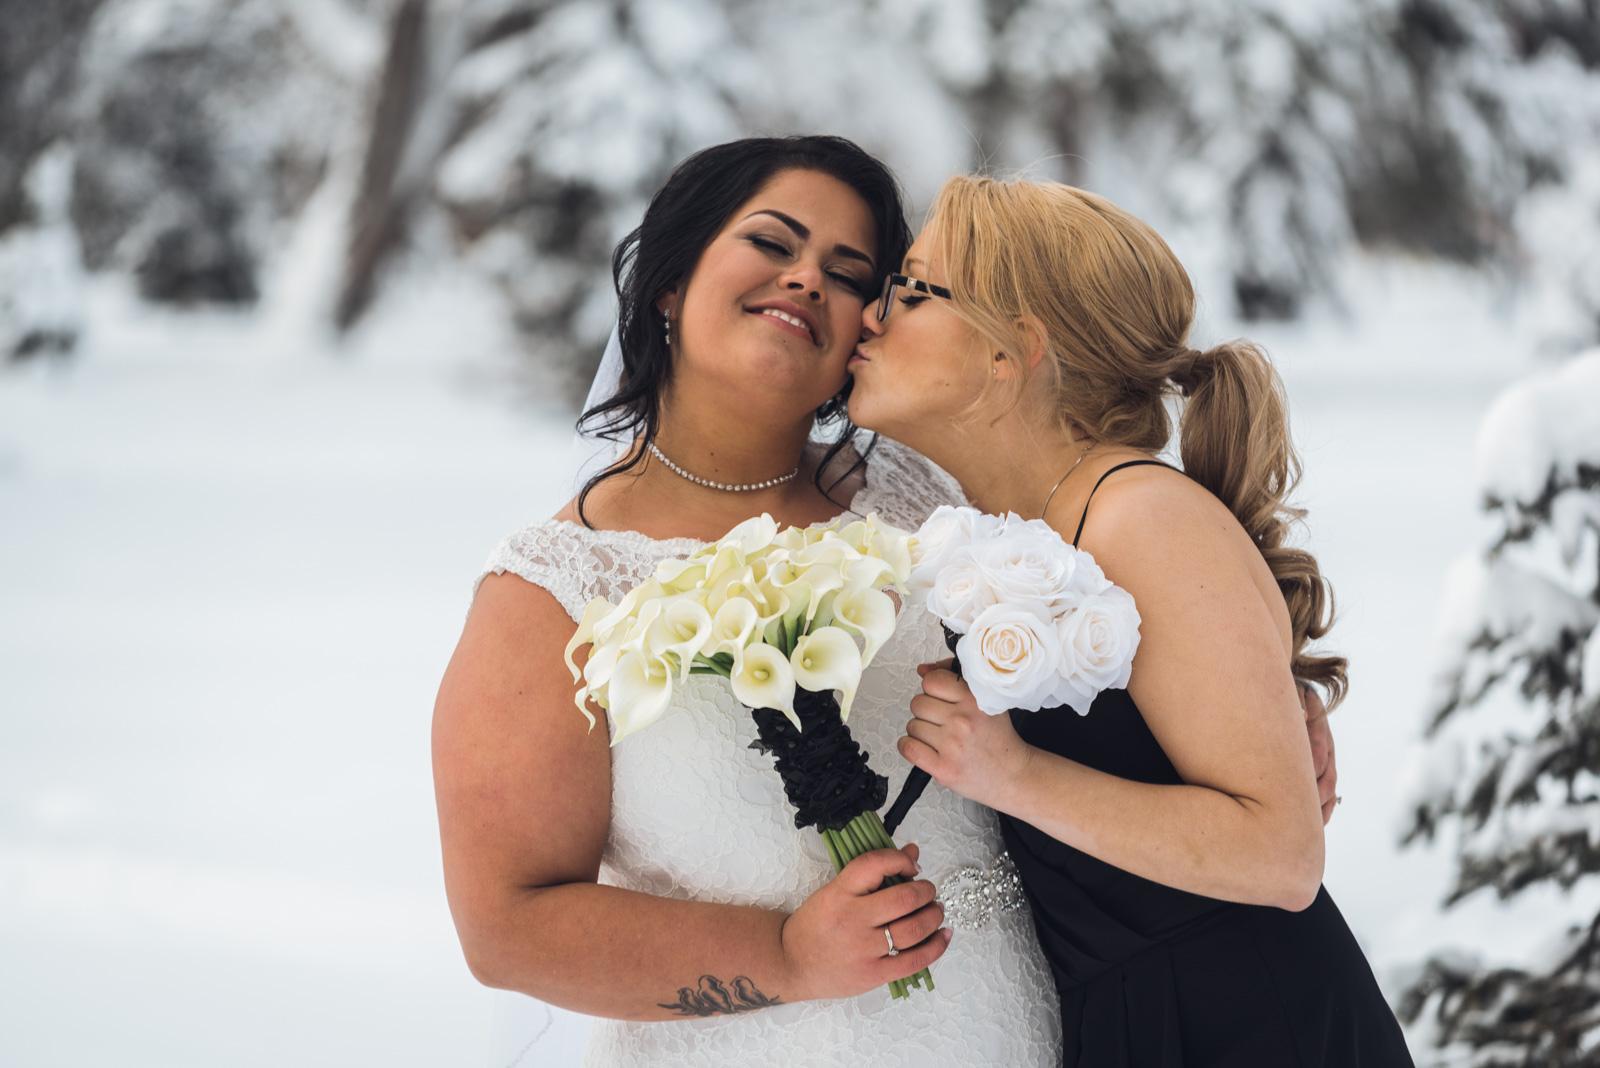 rheana-chris-wedding-blog-169.jpg